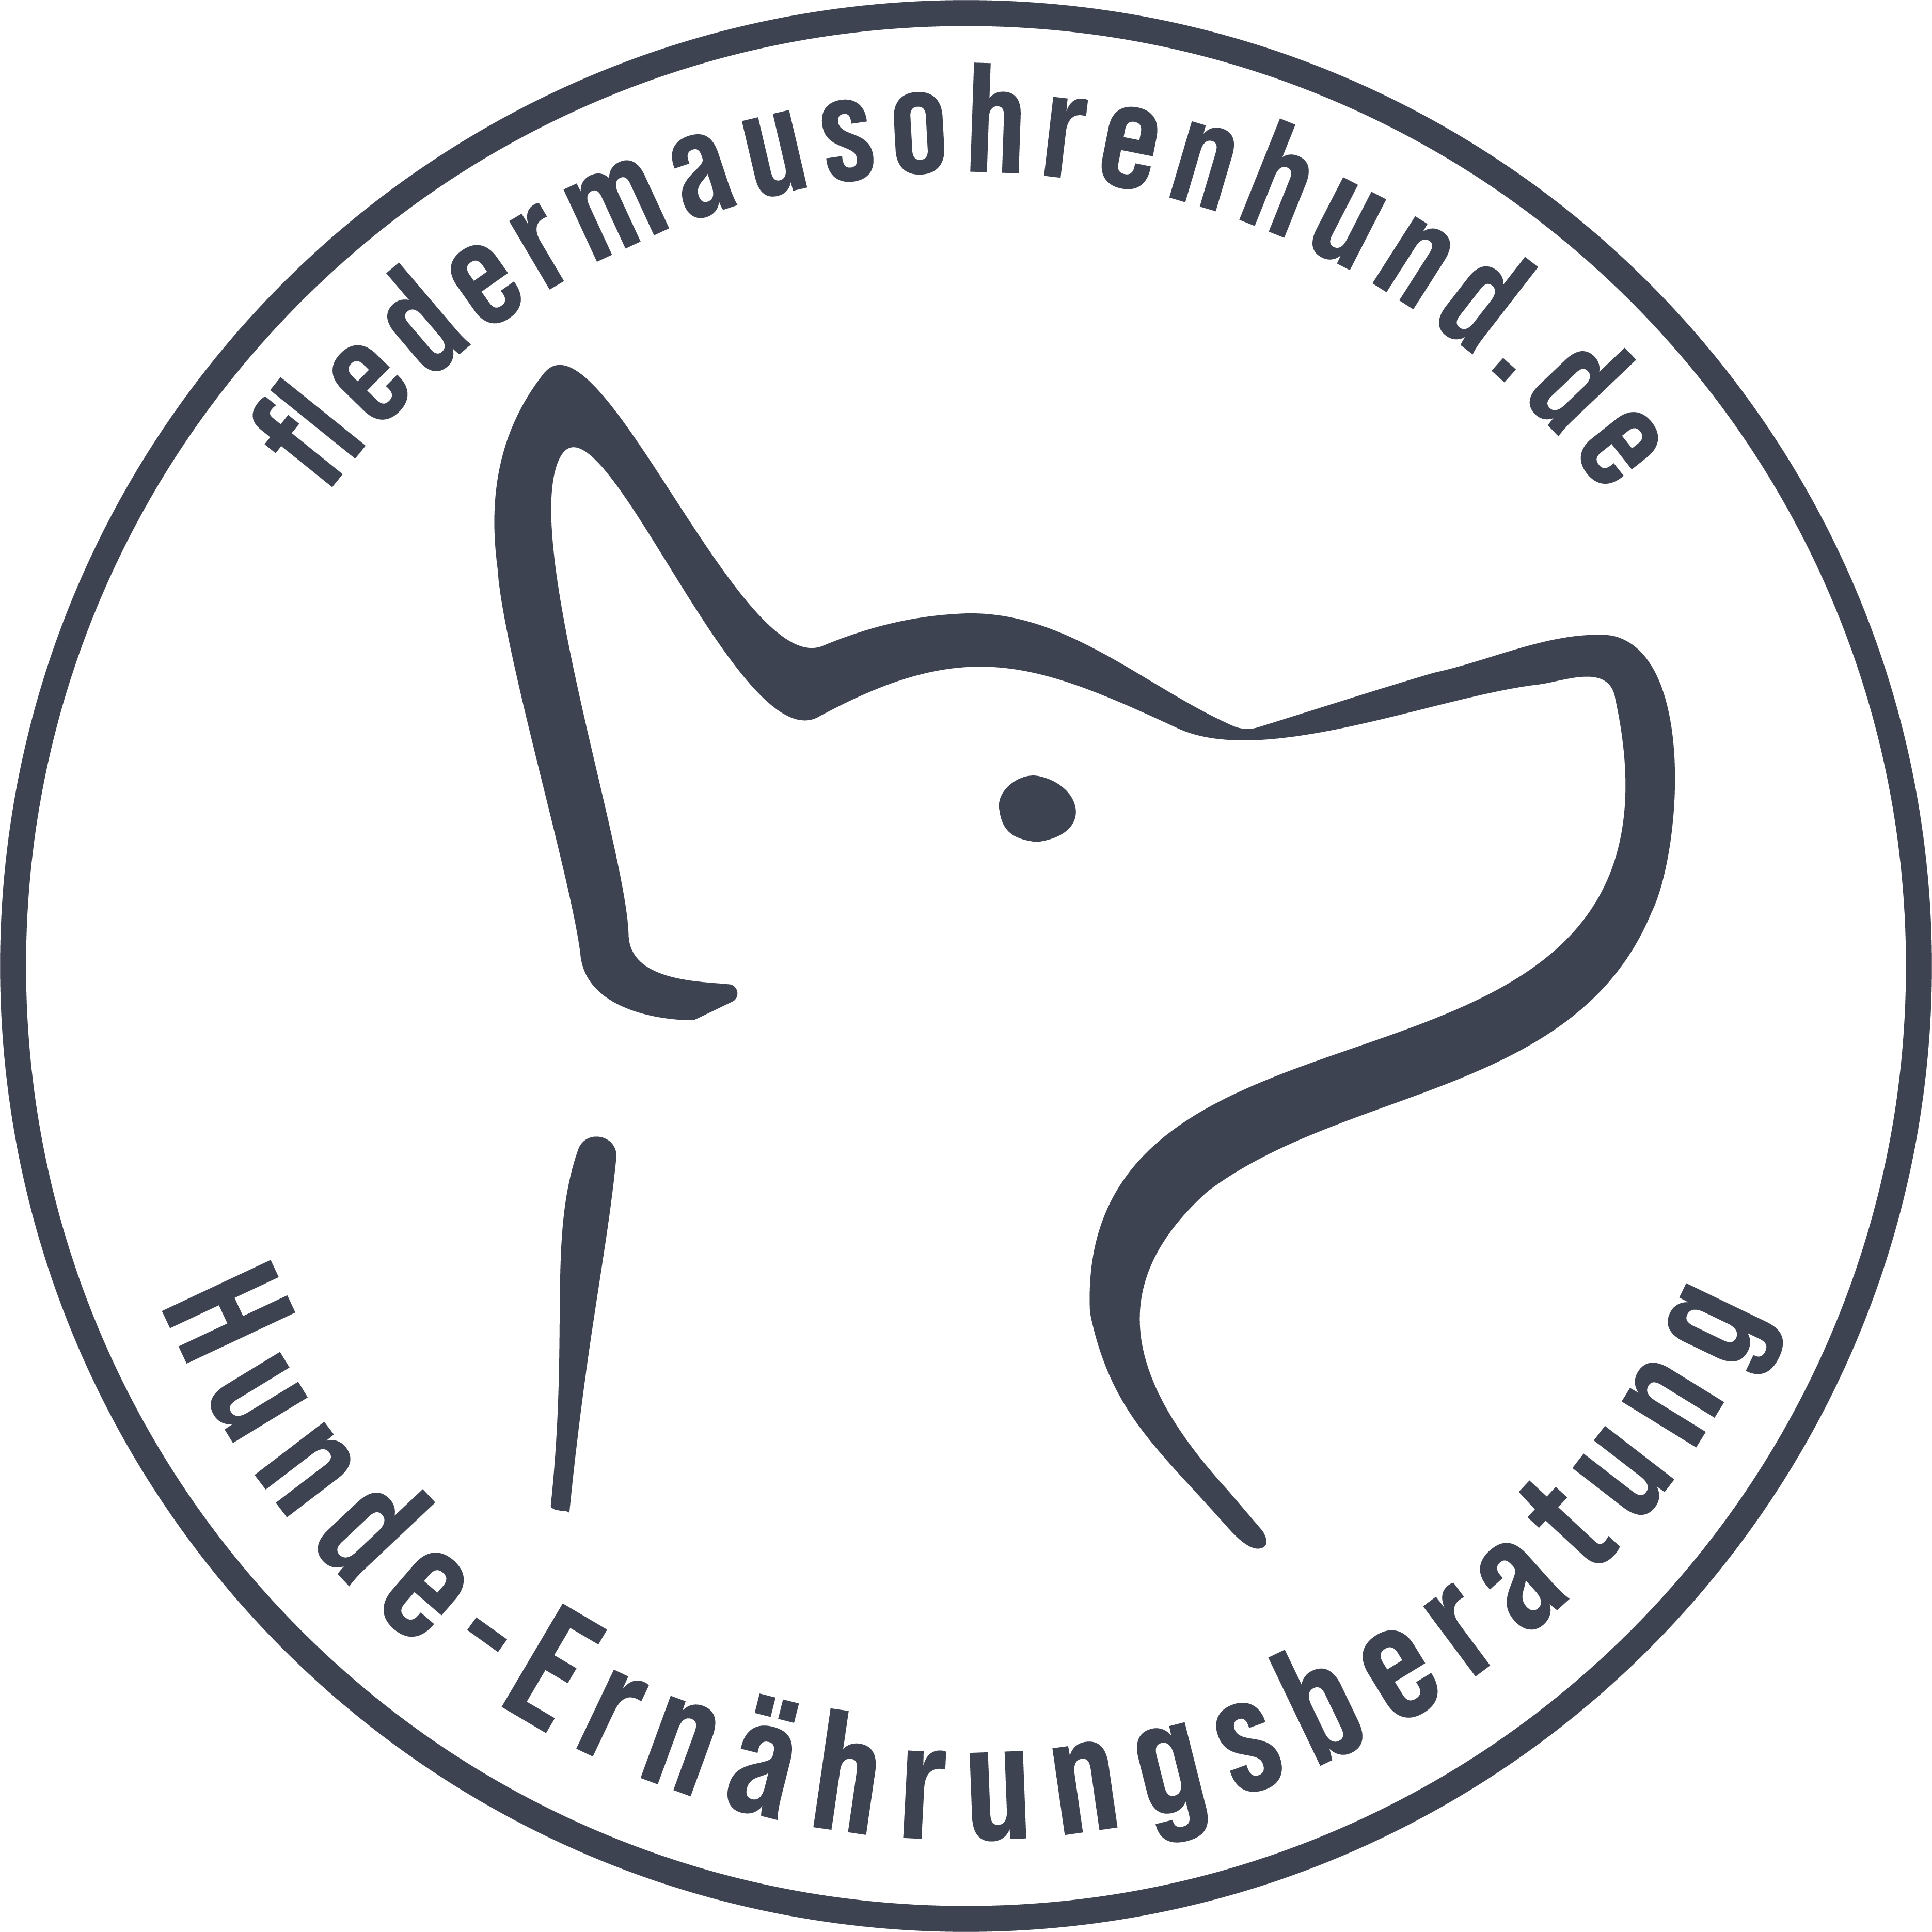 fledermausohrenhund.de